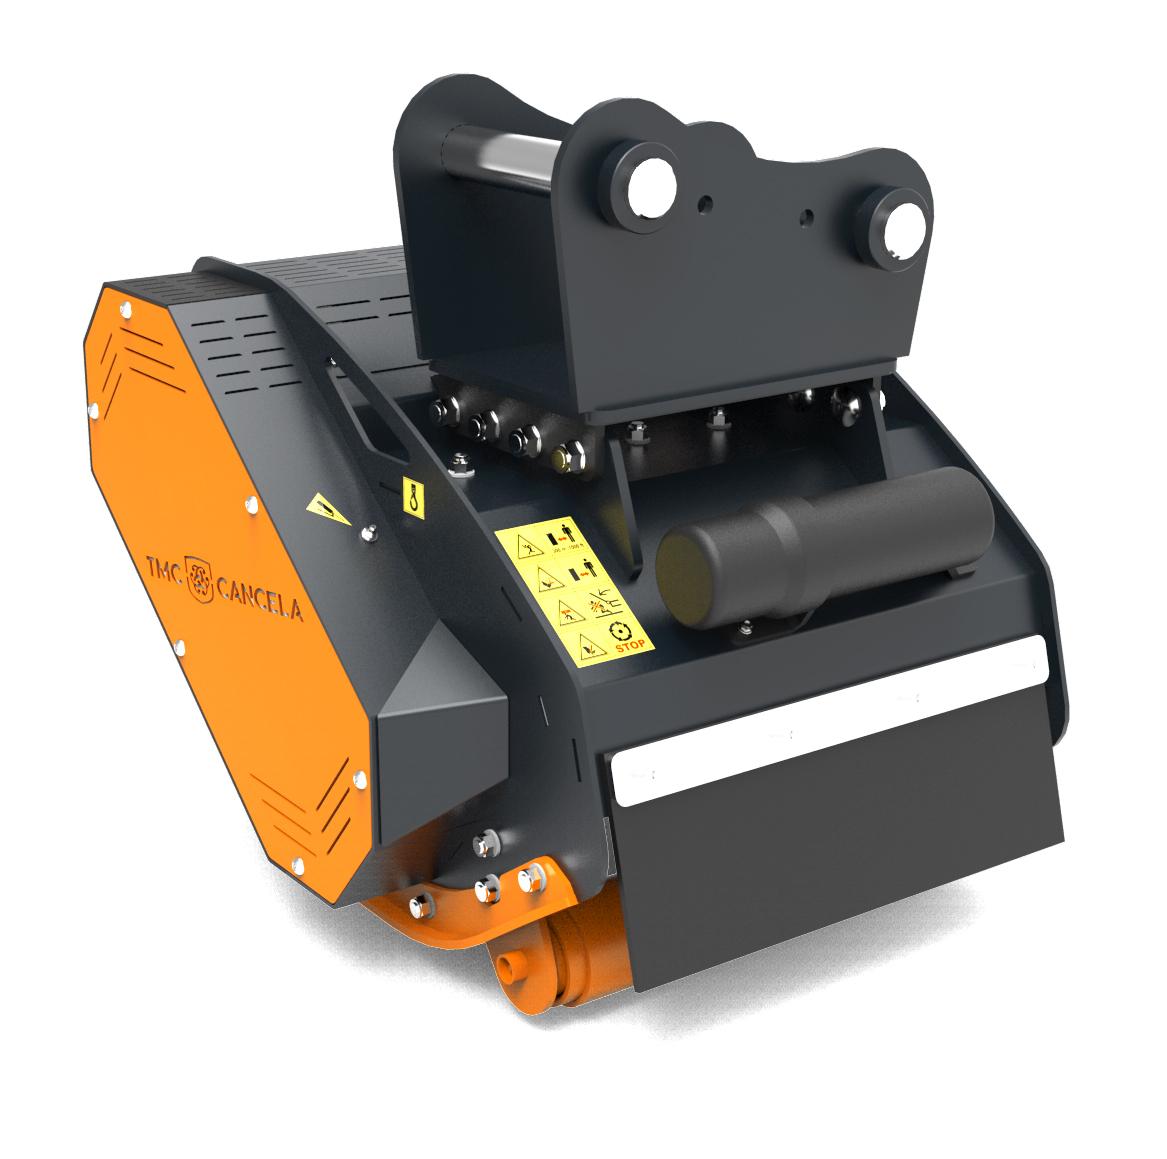 THA 1 Trinciatrice Trincia Trituradora Triturador Hidraulica A